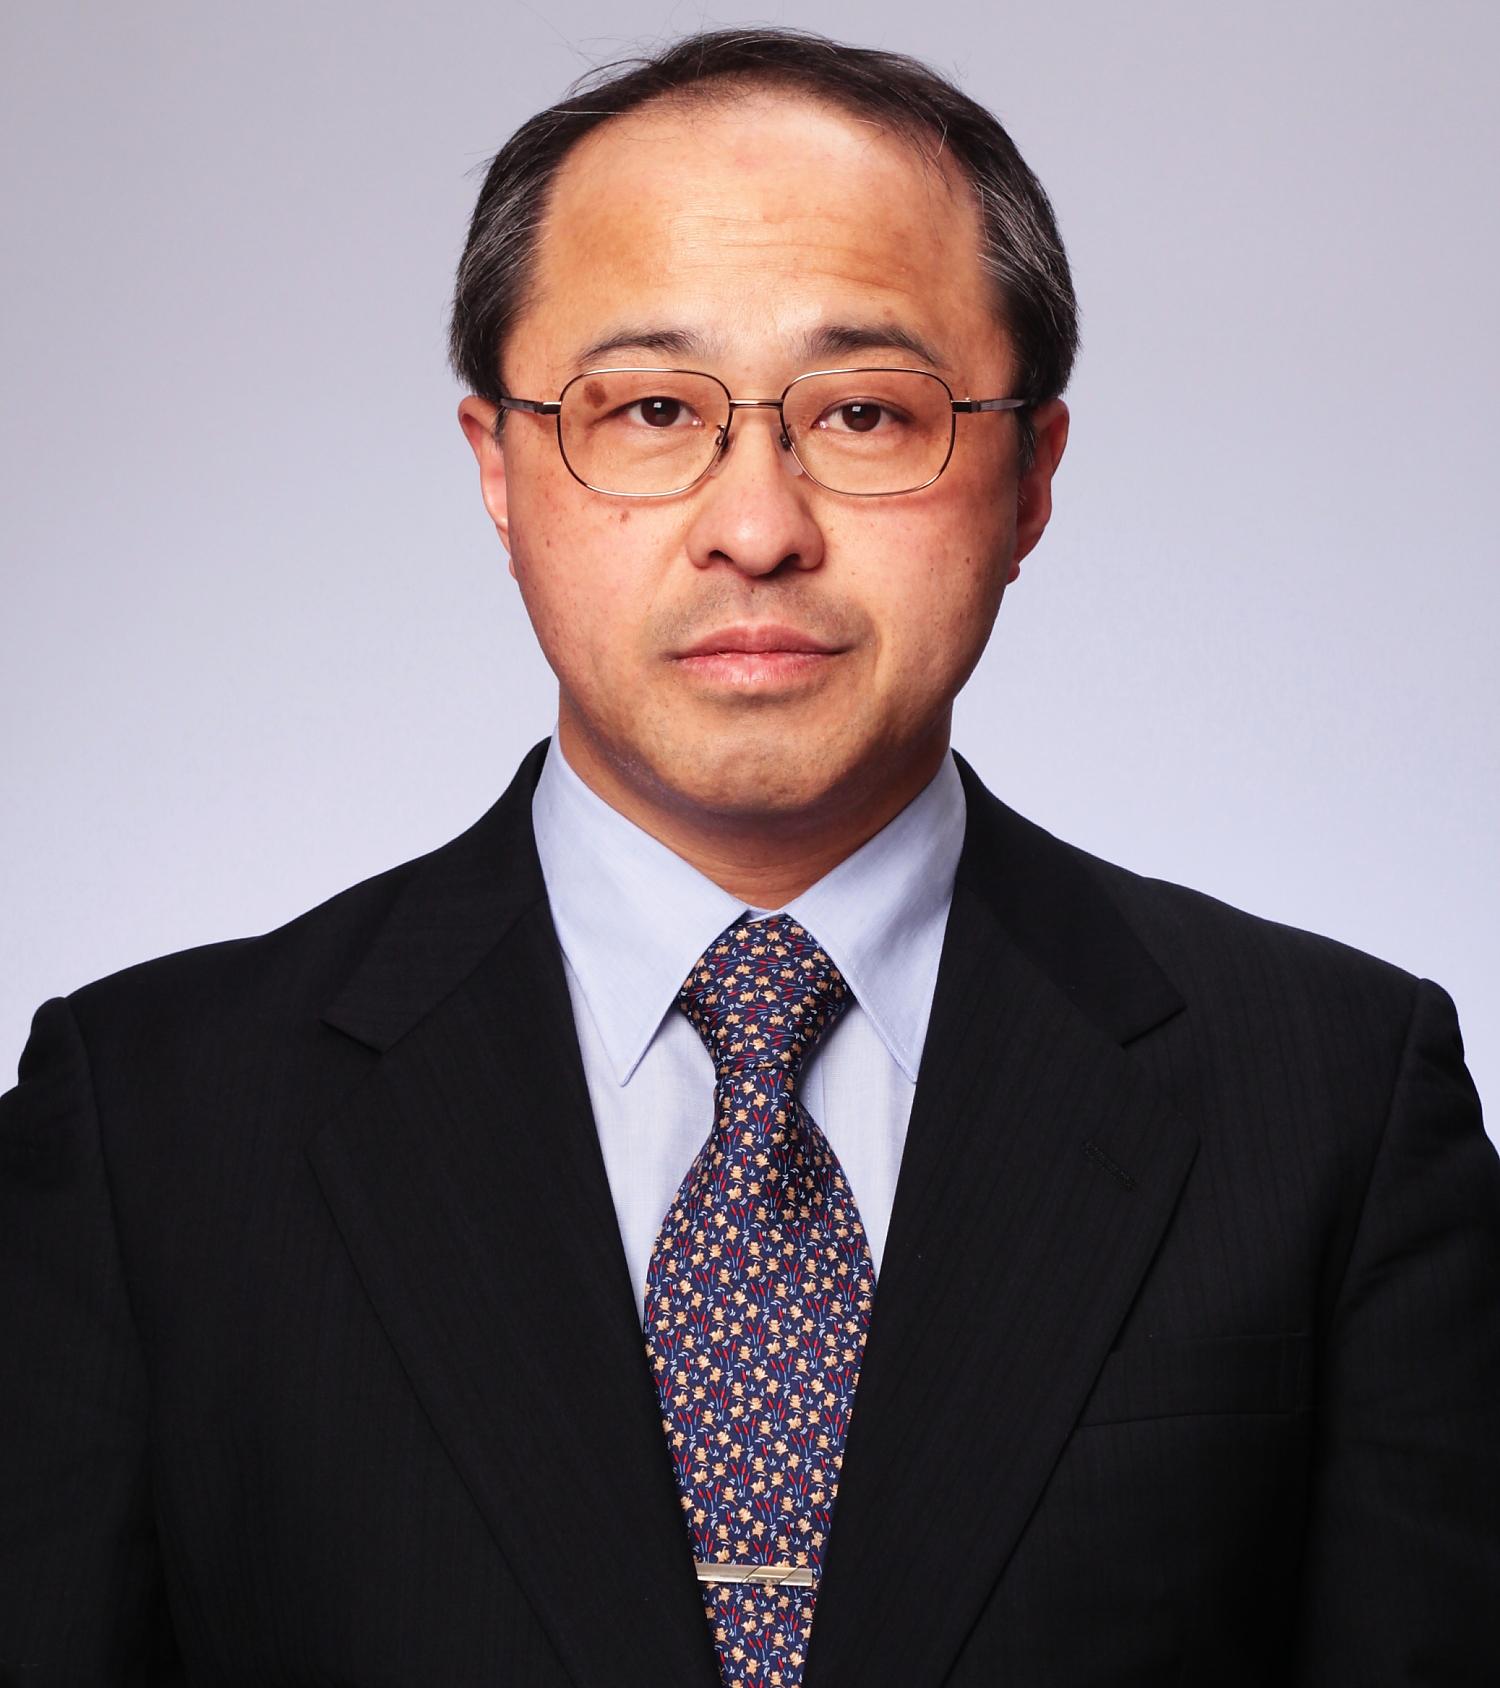 Professor Sato Tomomi